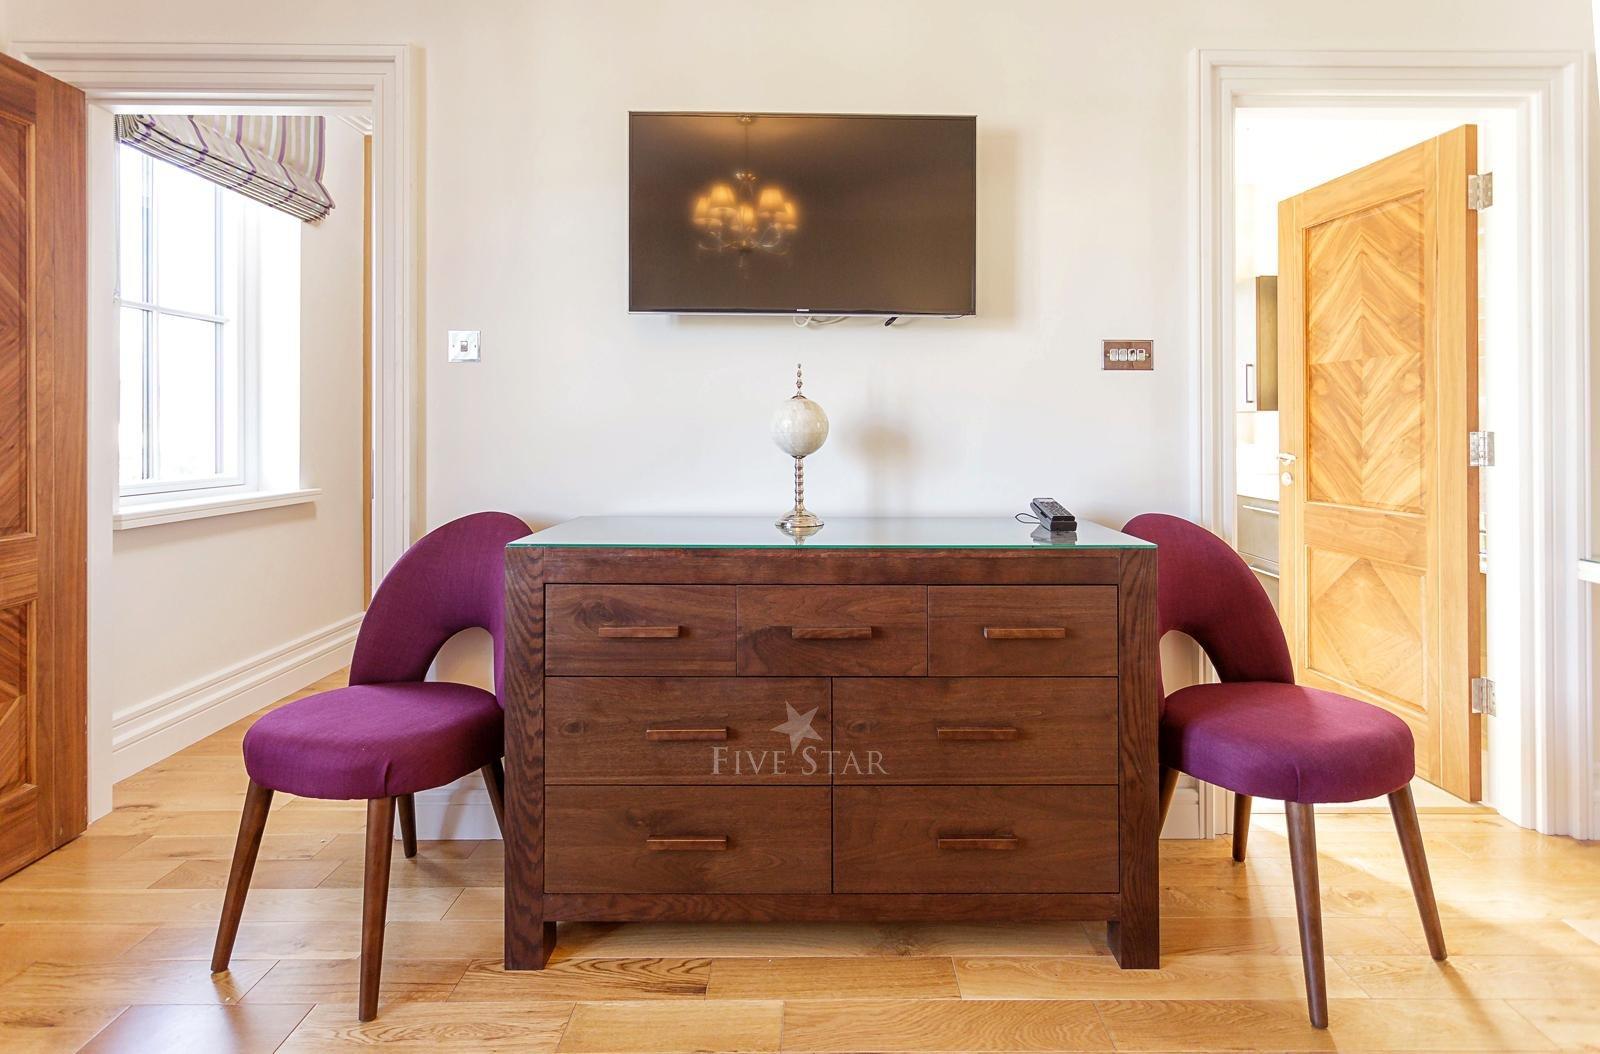 Luxquisite 5-Star Killarney Residence photo 29